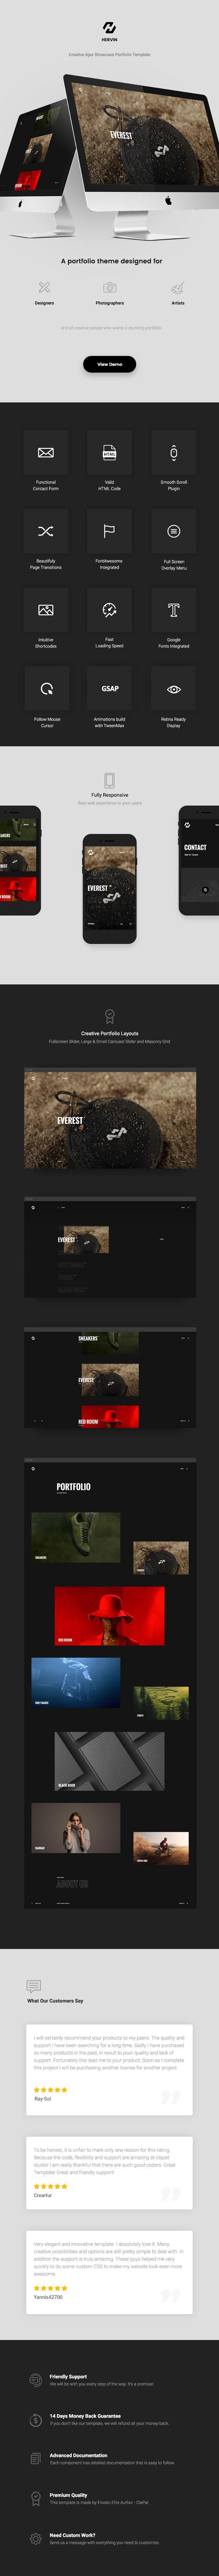 HTML showcase portfolio Hervin